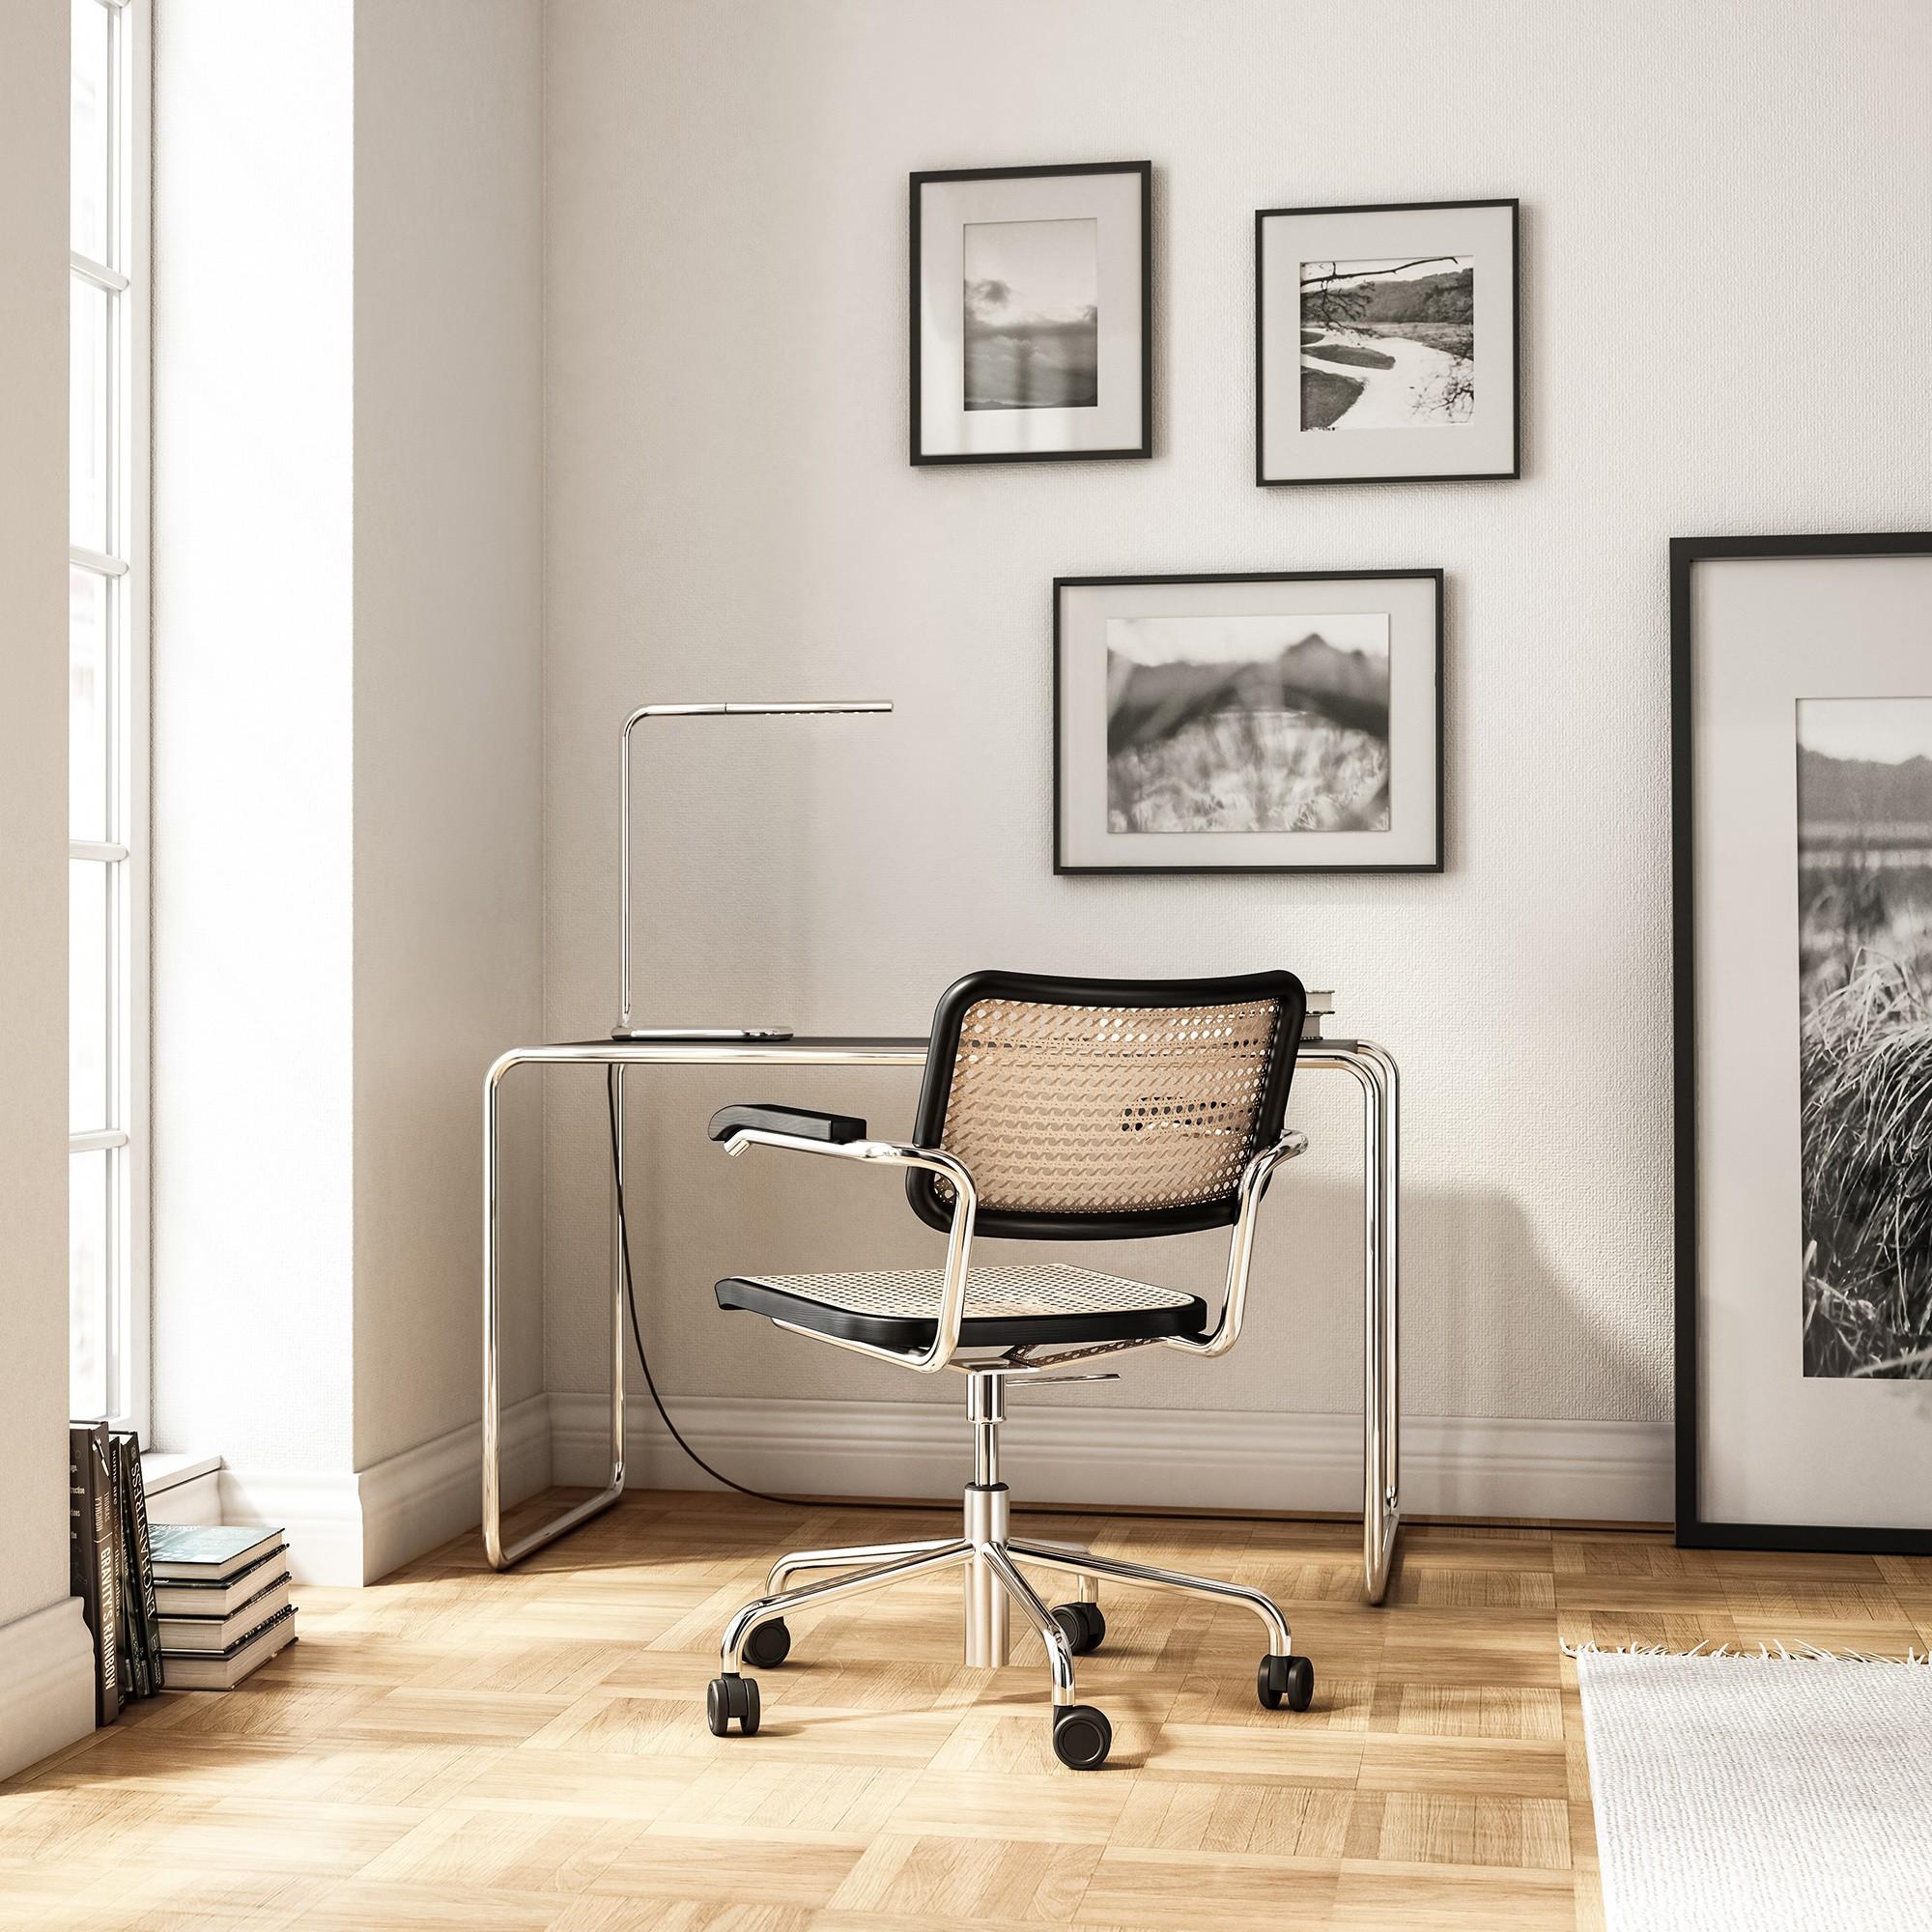 Thonet S 285 0 Desk Ambientedirect